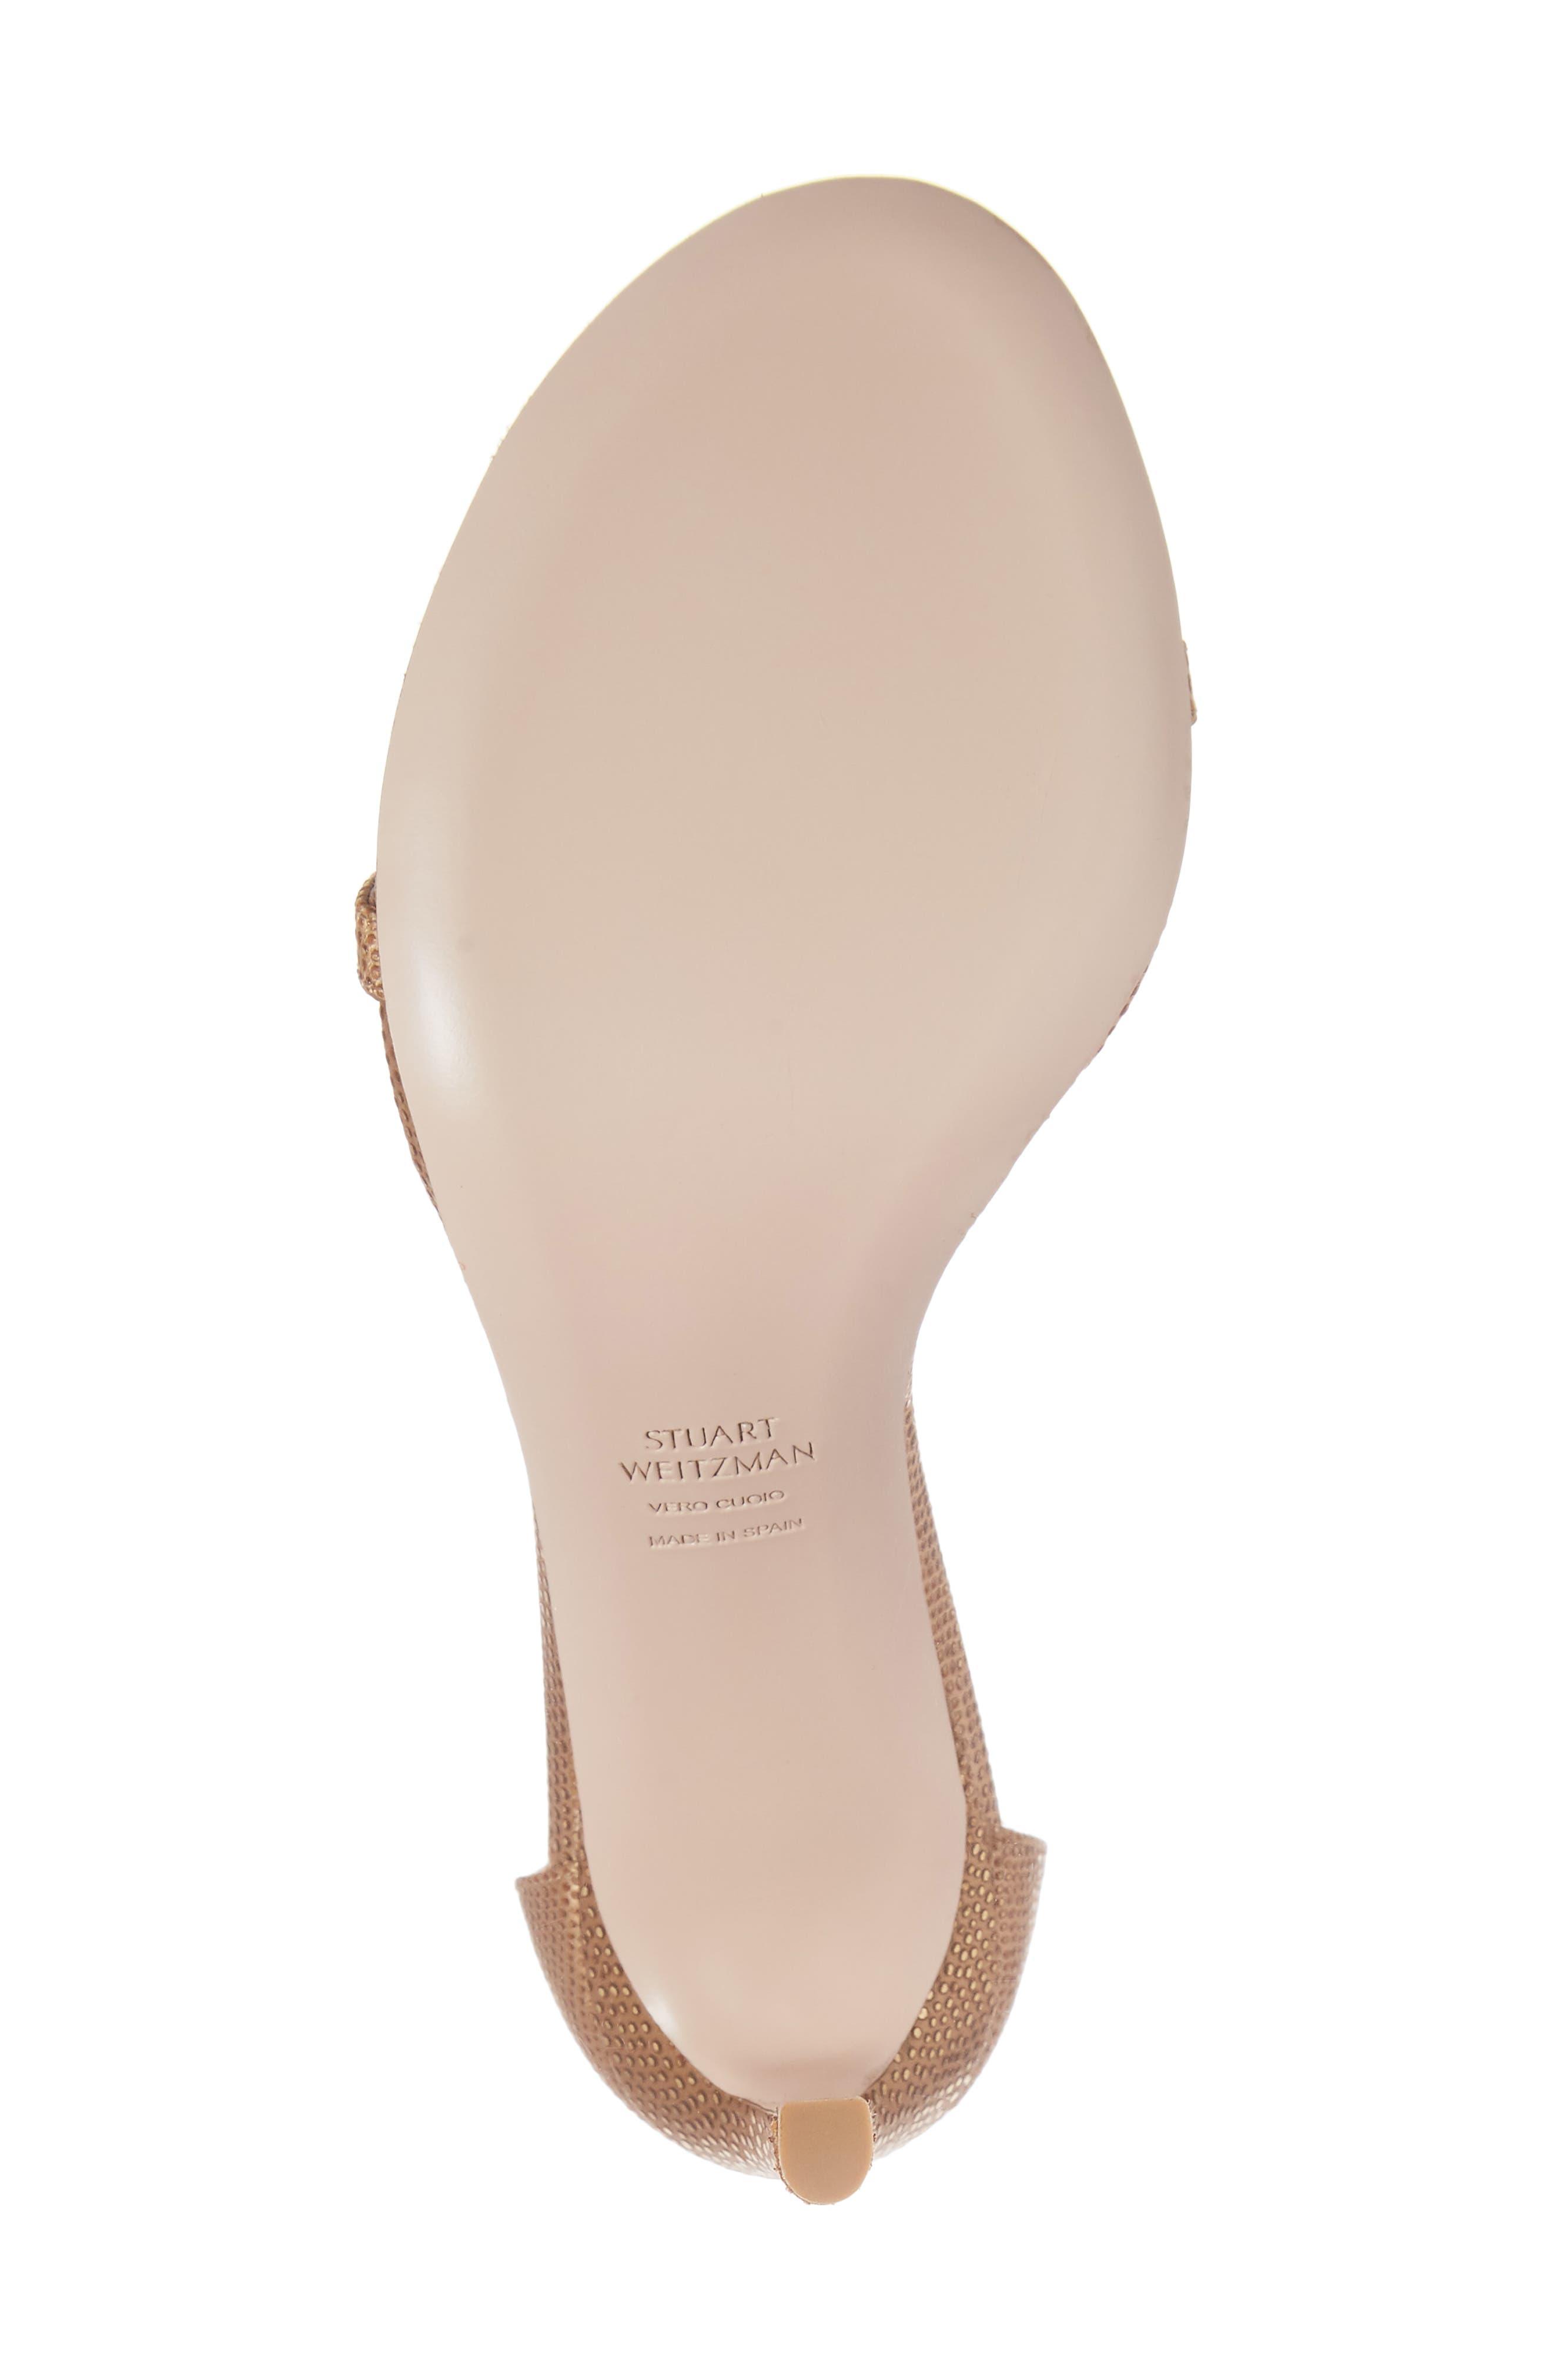 Nudistsong Ankle Strap Sandal,                             Alternate thumbnail 6, color,                             Gold Dot